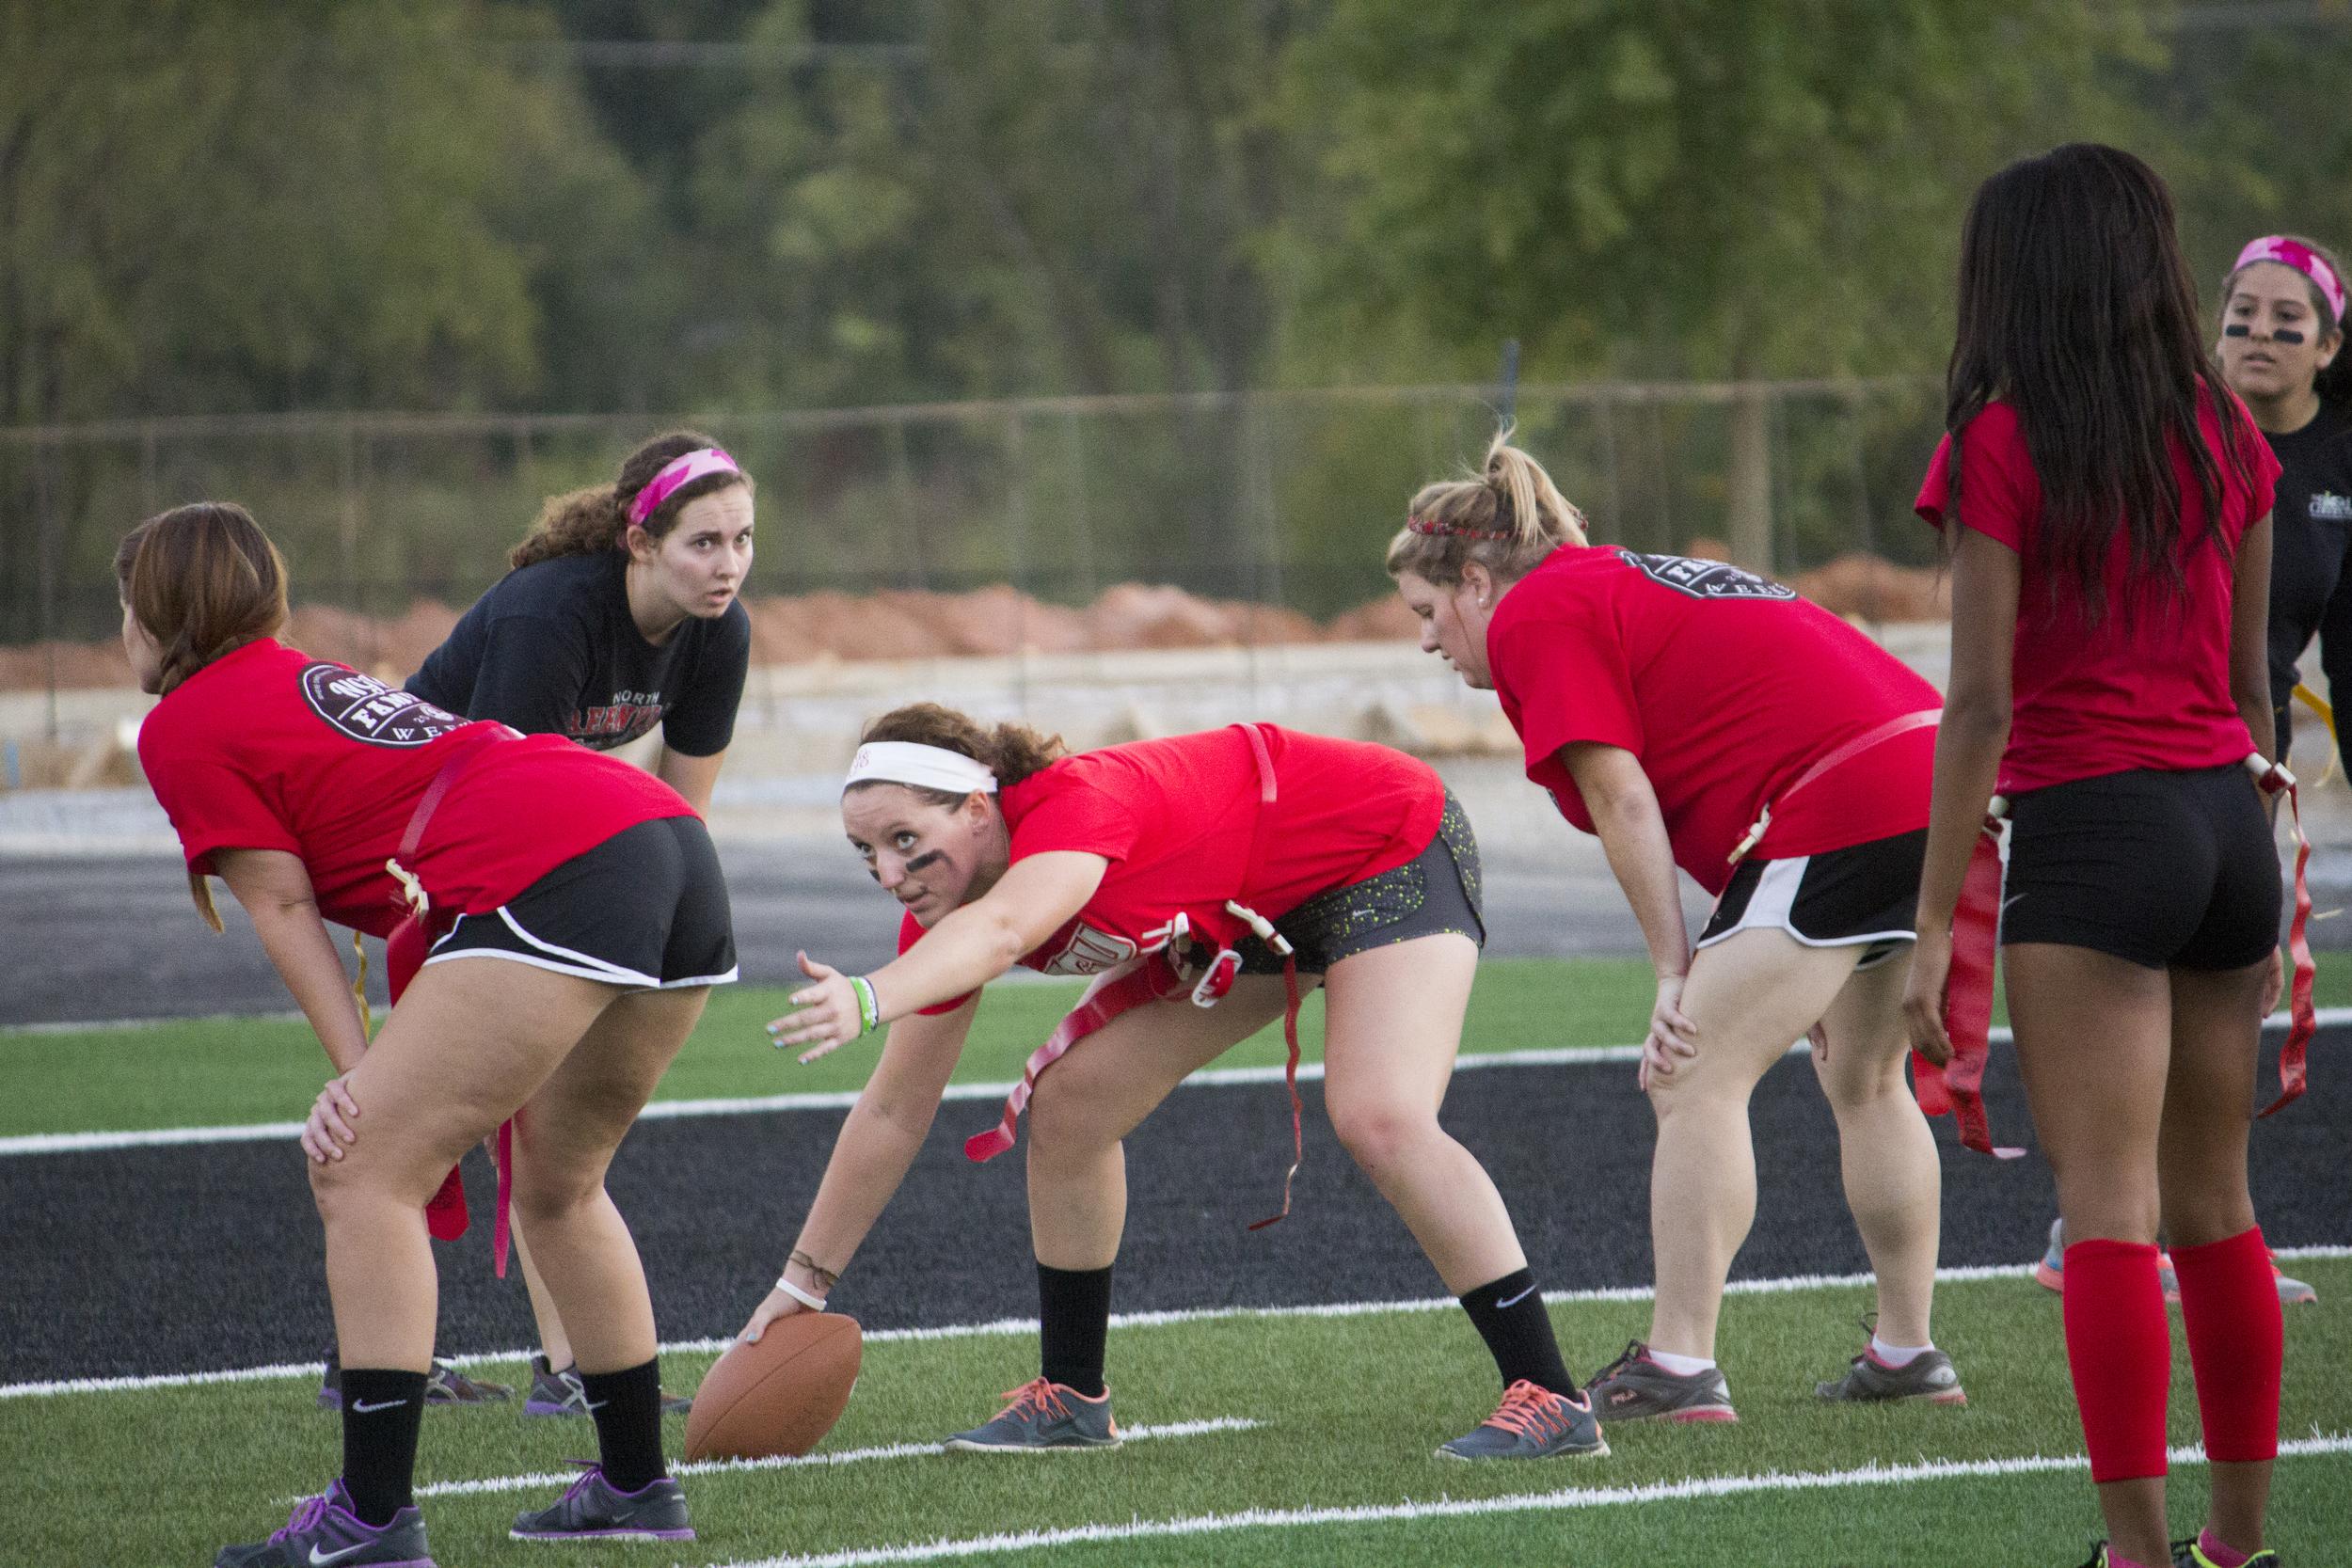 Senior Tori Freedman directs her fellow teammates before she hikes the ball.